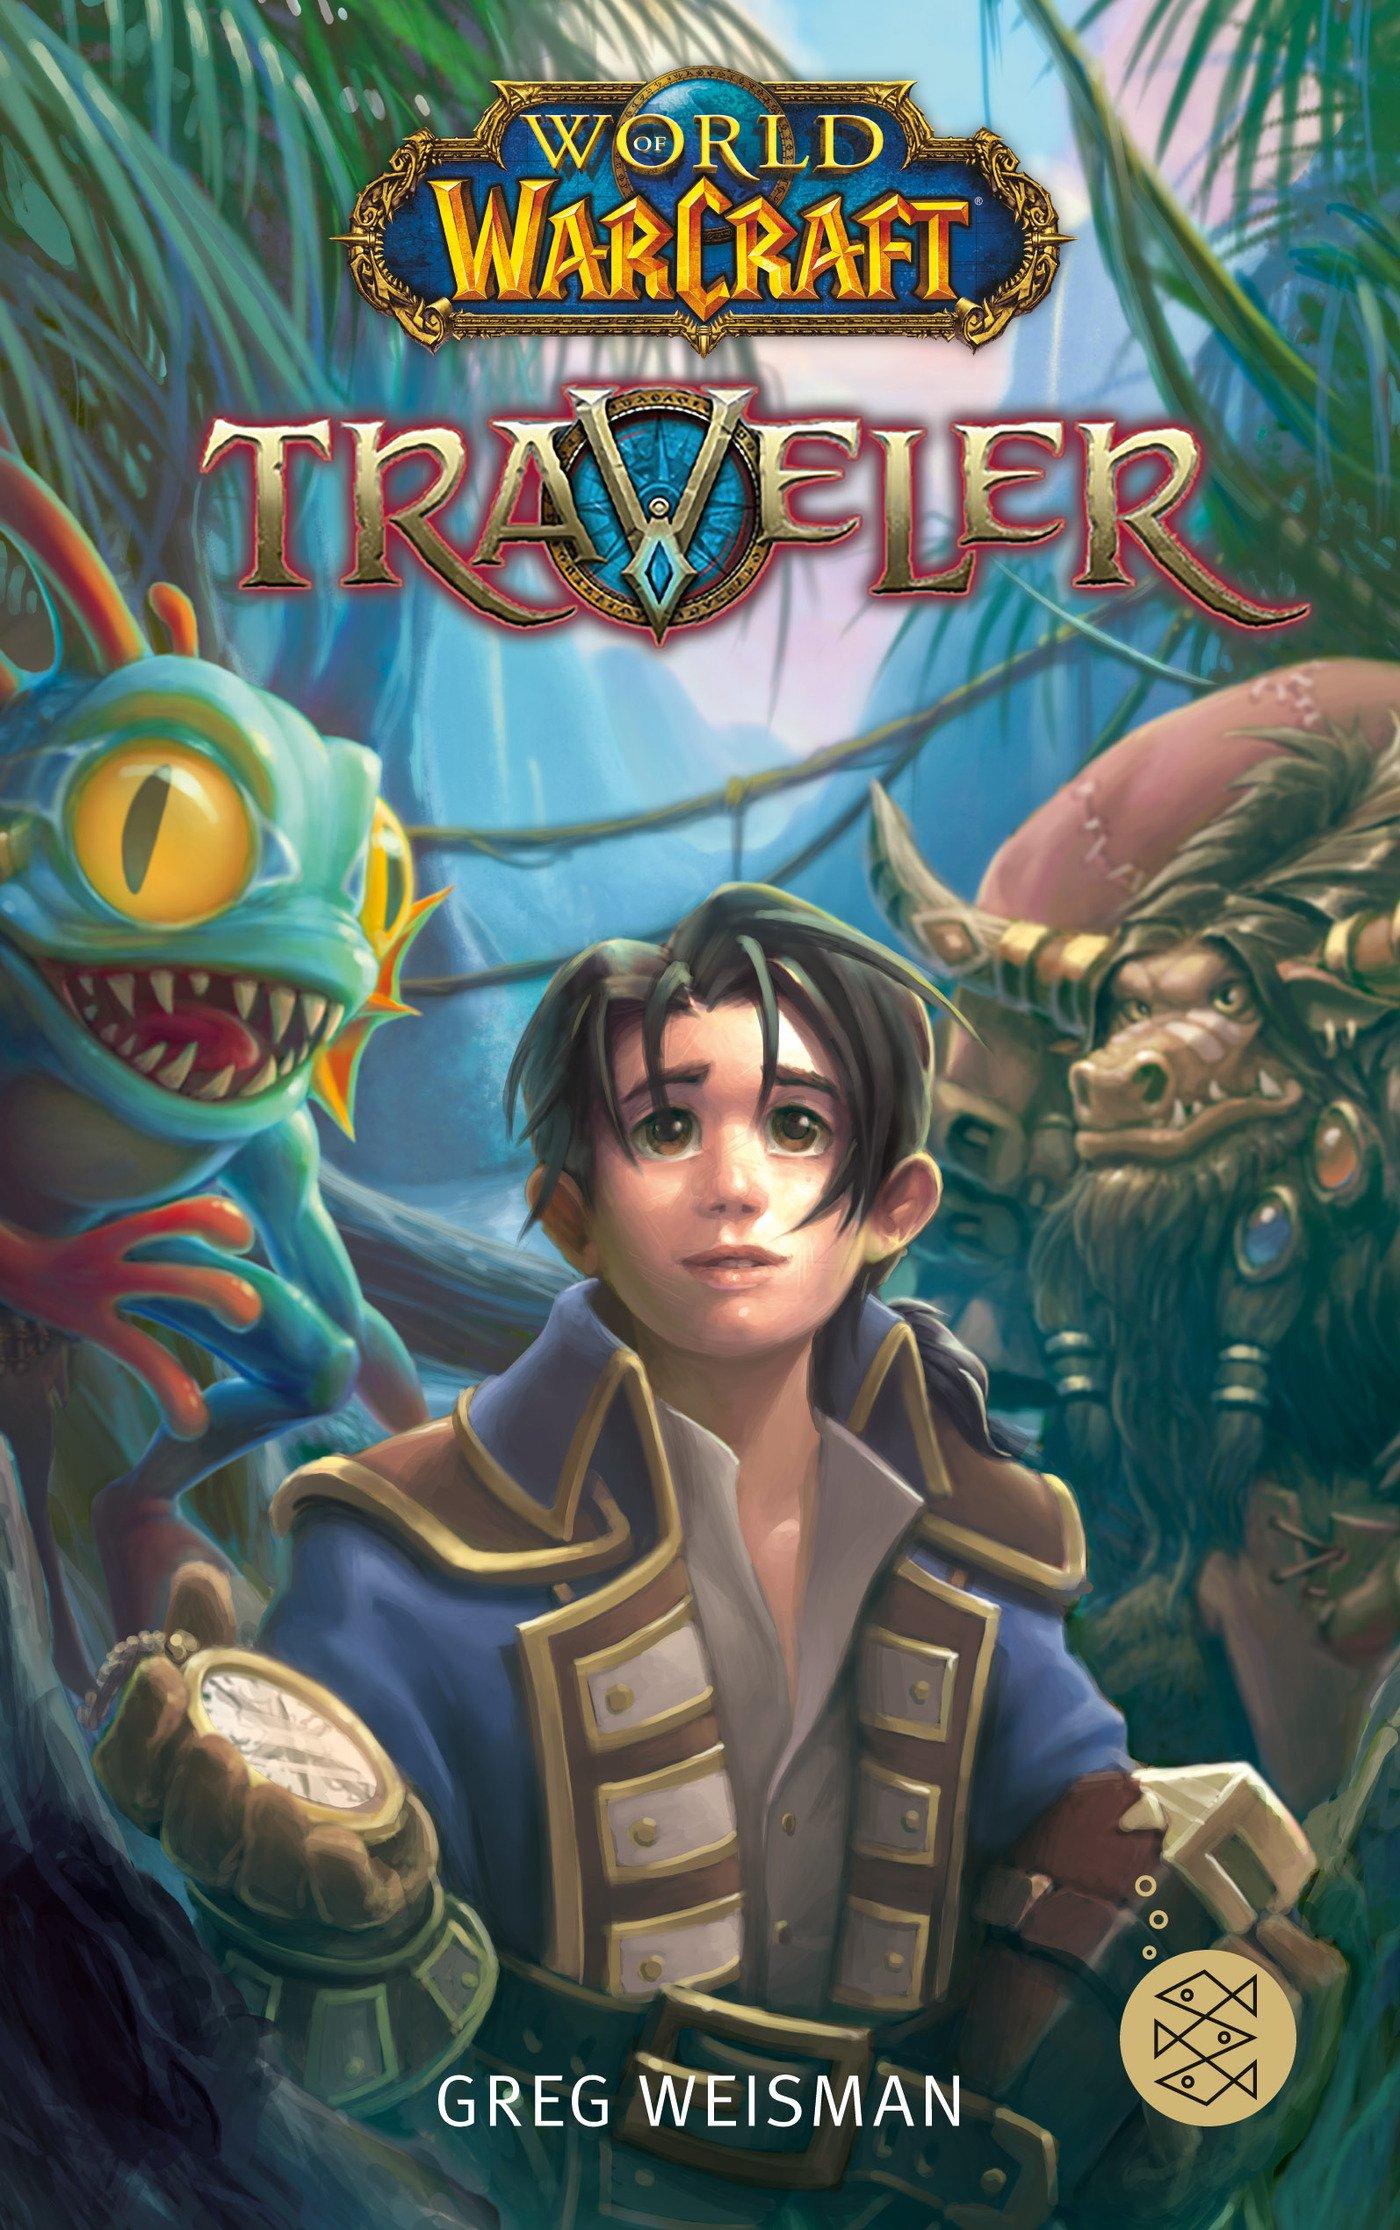 World of Warcraft: Traveler Broschiert – 27. Juli 2017 Greg Weisman Samwise Didier Andreas Kasprzak 3733503910